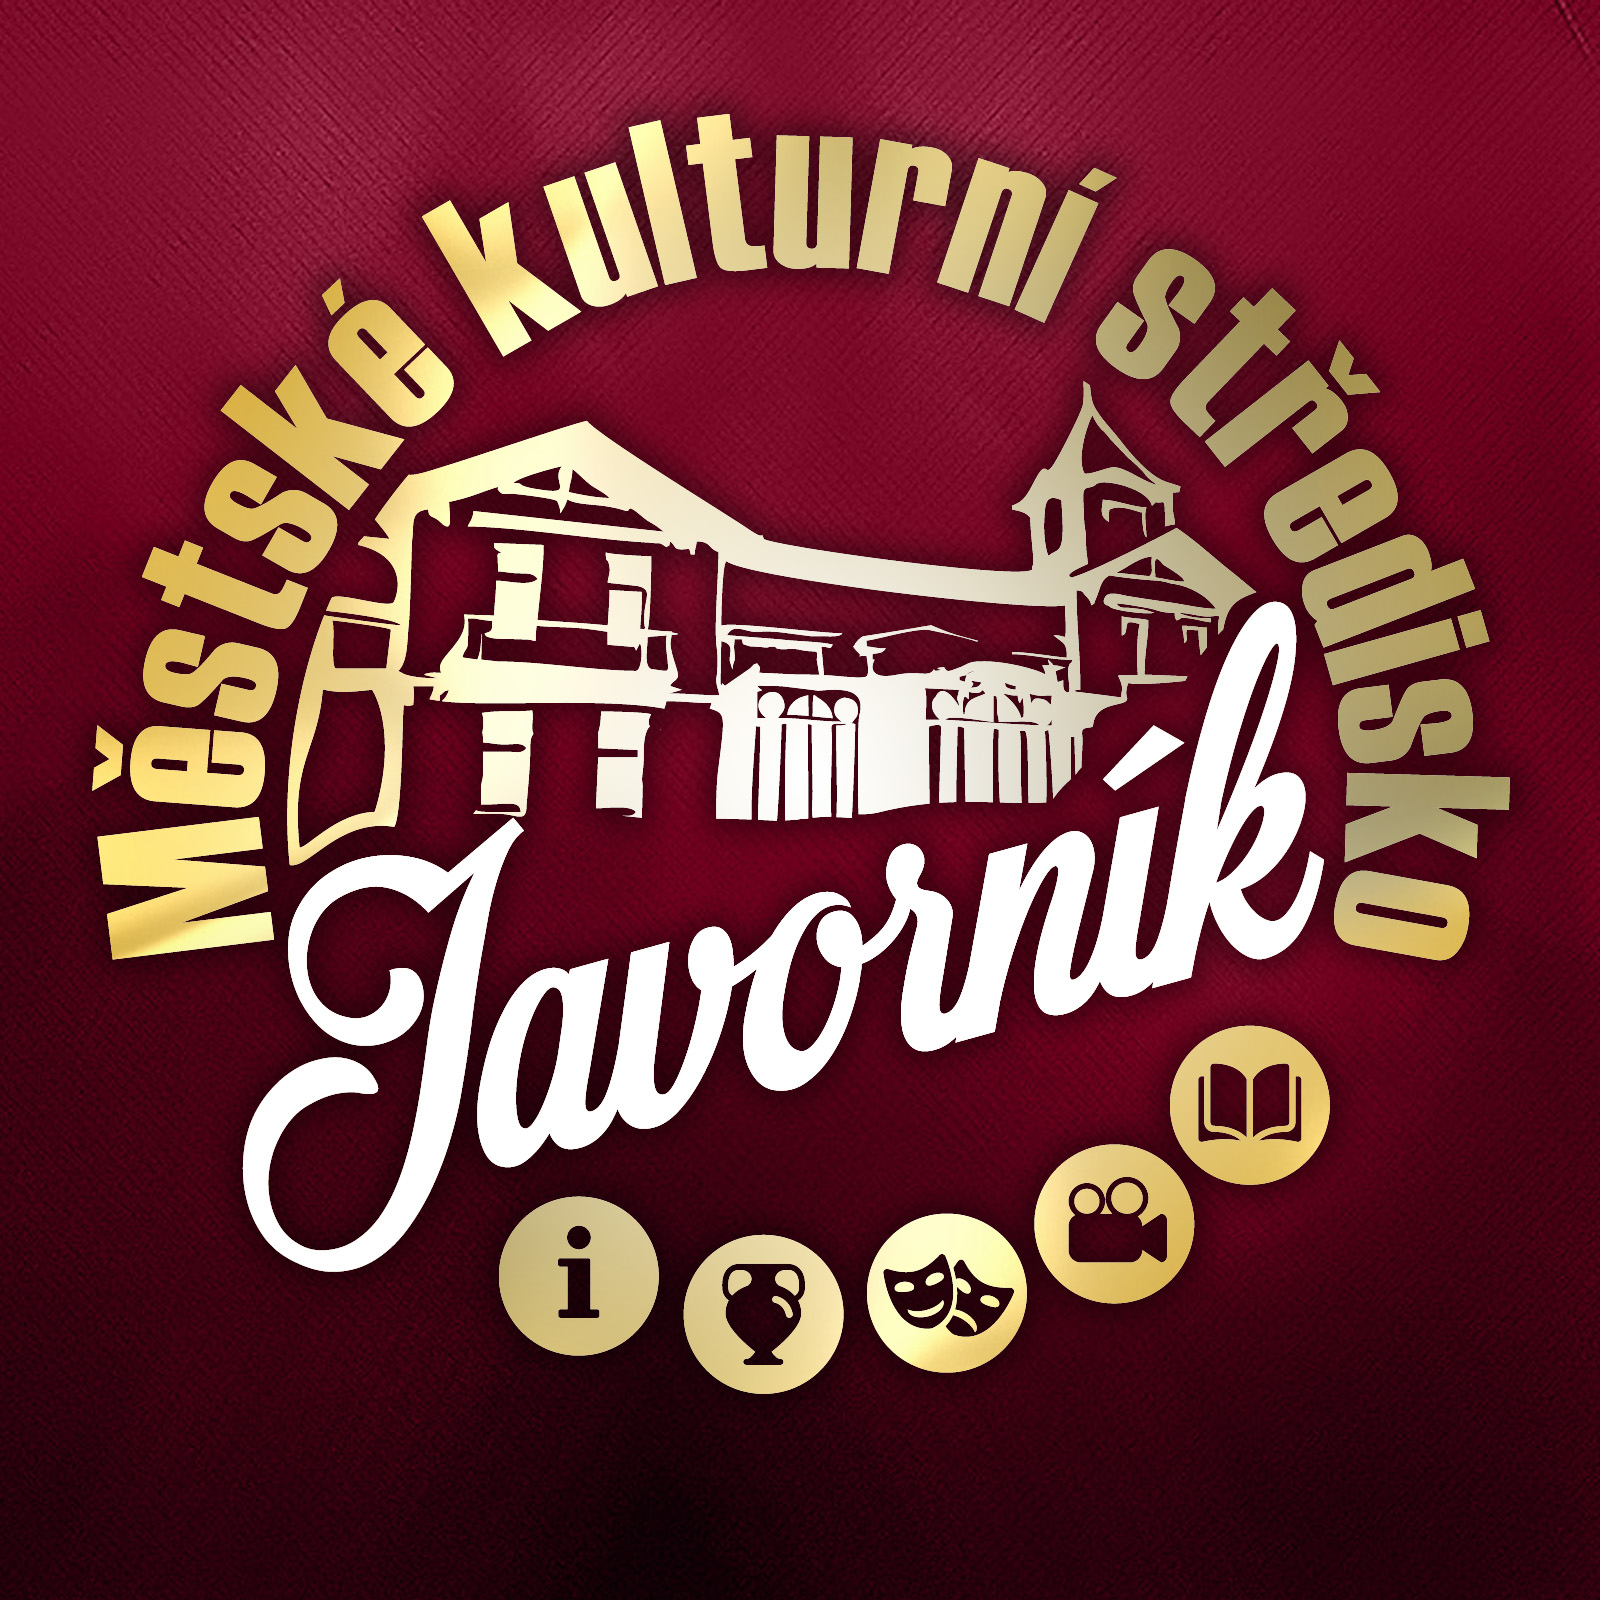 <p>Městsk&eacute; kulturn&iacute; středisko Javorn&iacute;k</p>